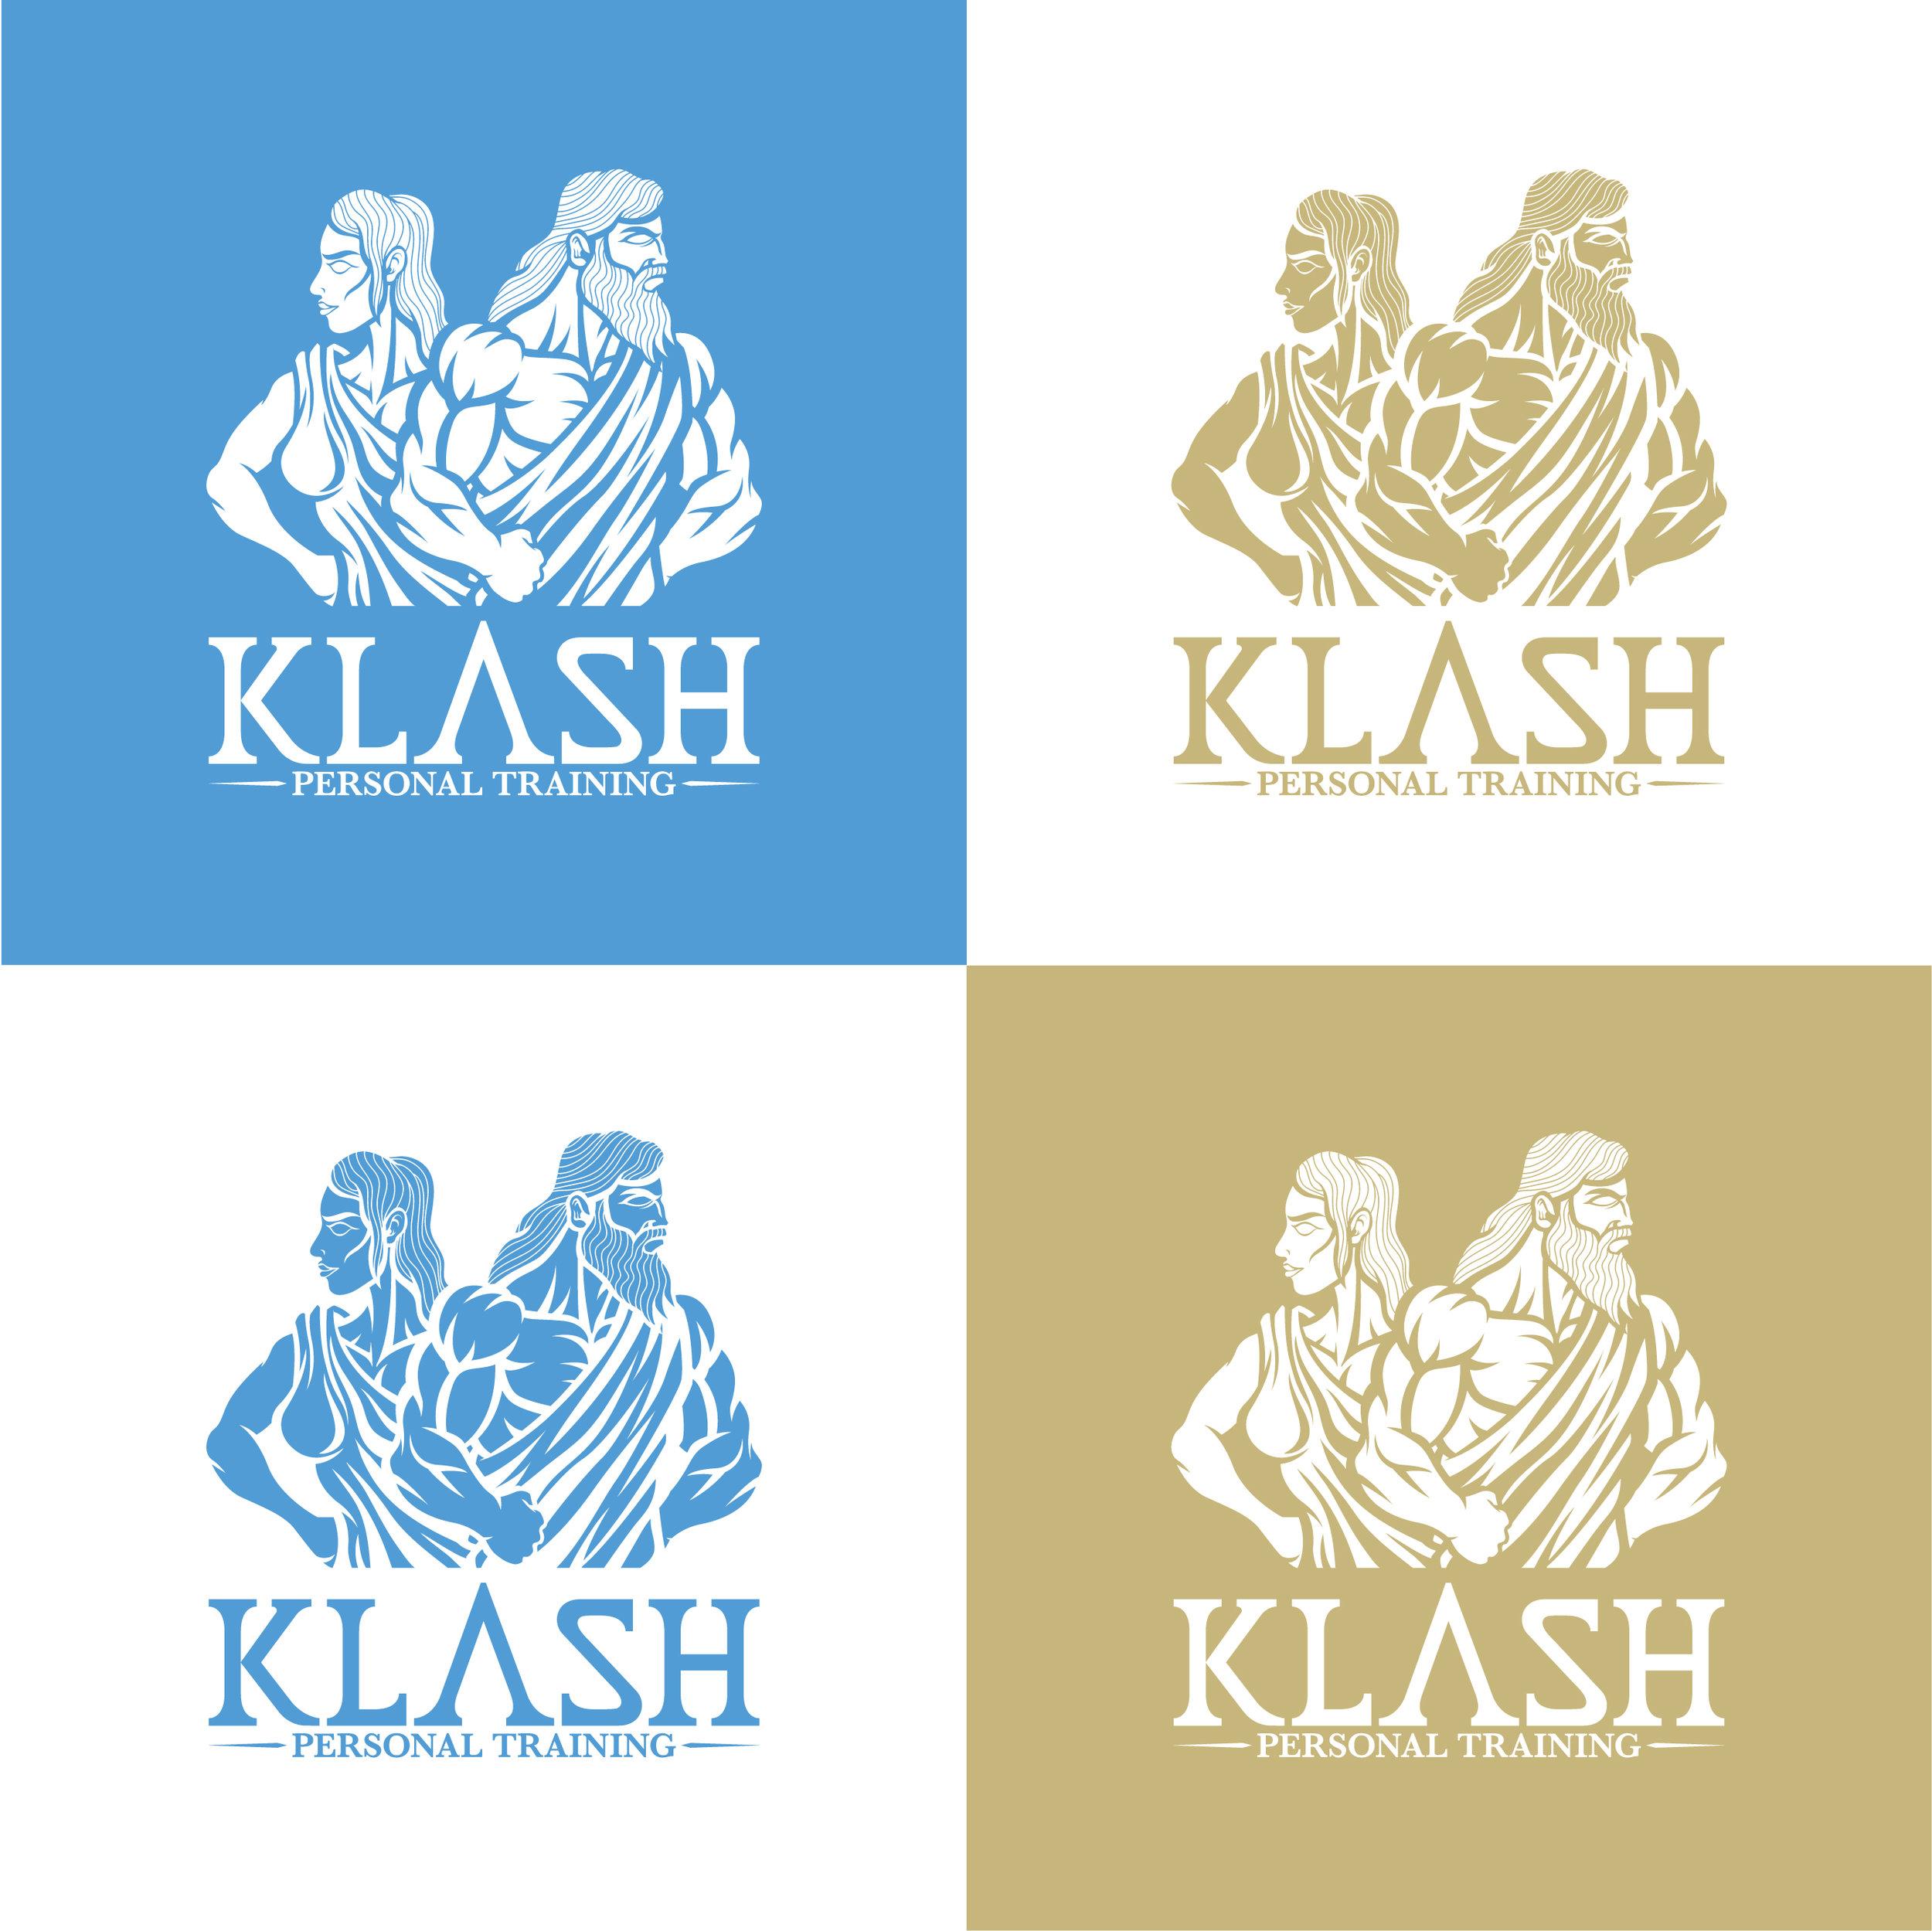 klash-personal-training-logo-logos-branding-greek-roman-graphicdesign-orozco-design-roberto-identity-vegas-lasvegas-vector-white.jpg